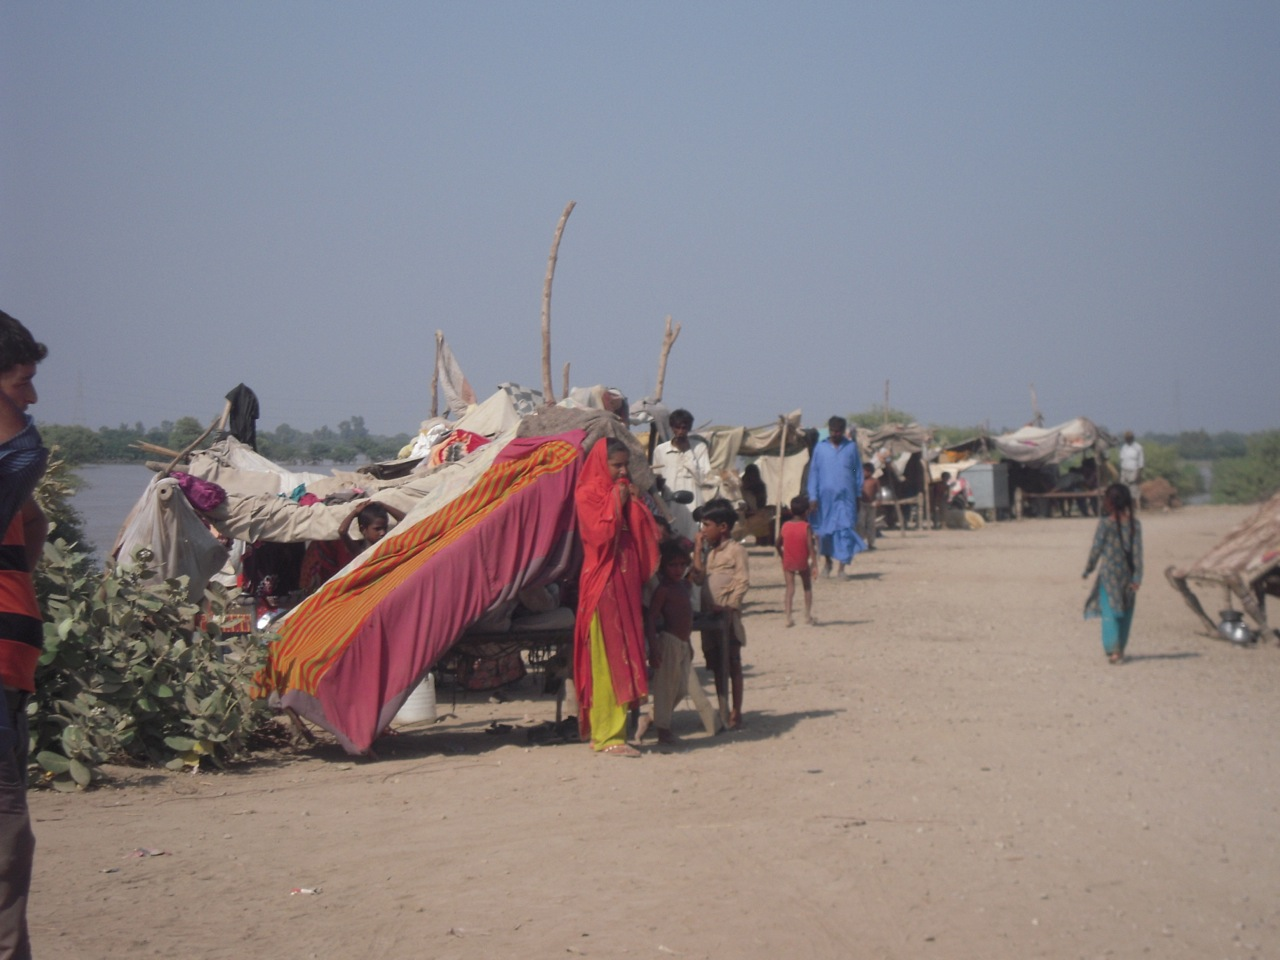 The khana badosh community who are receiving no government assistance